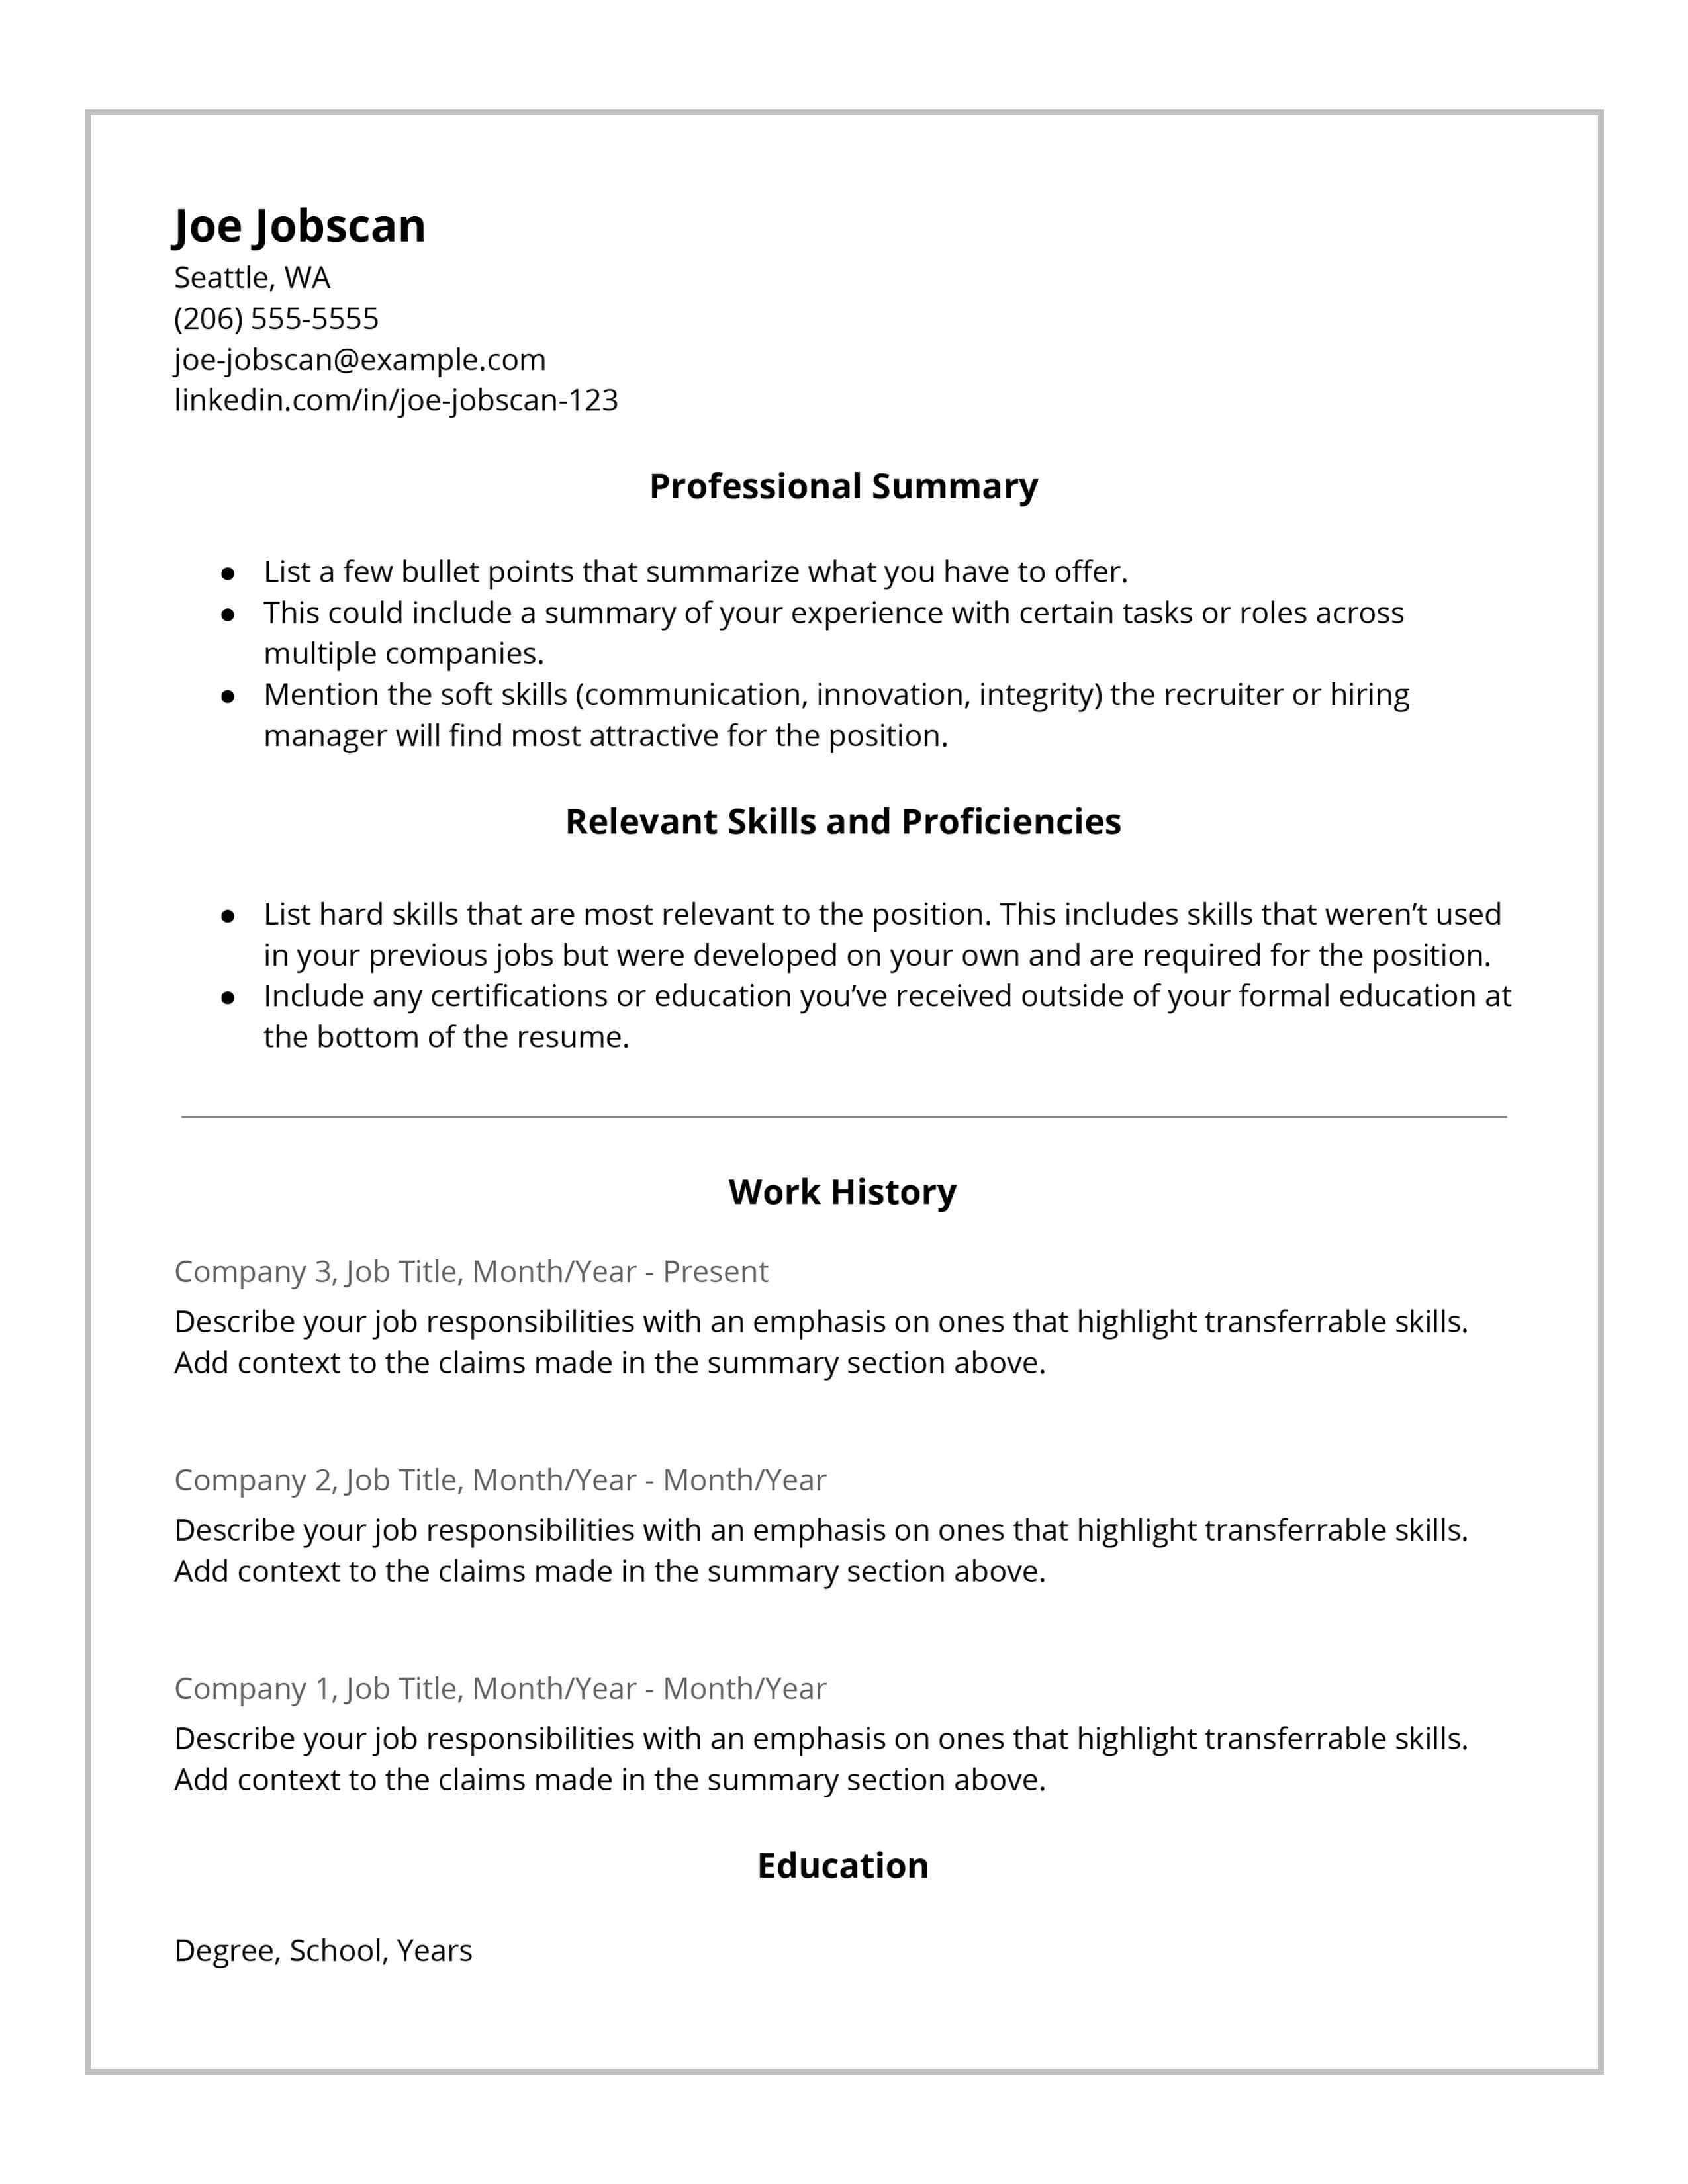 Functional Resume Template Hybrid Resume Template functional resume template|wikiresume.com